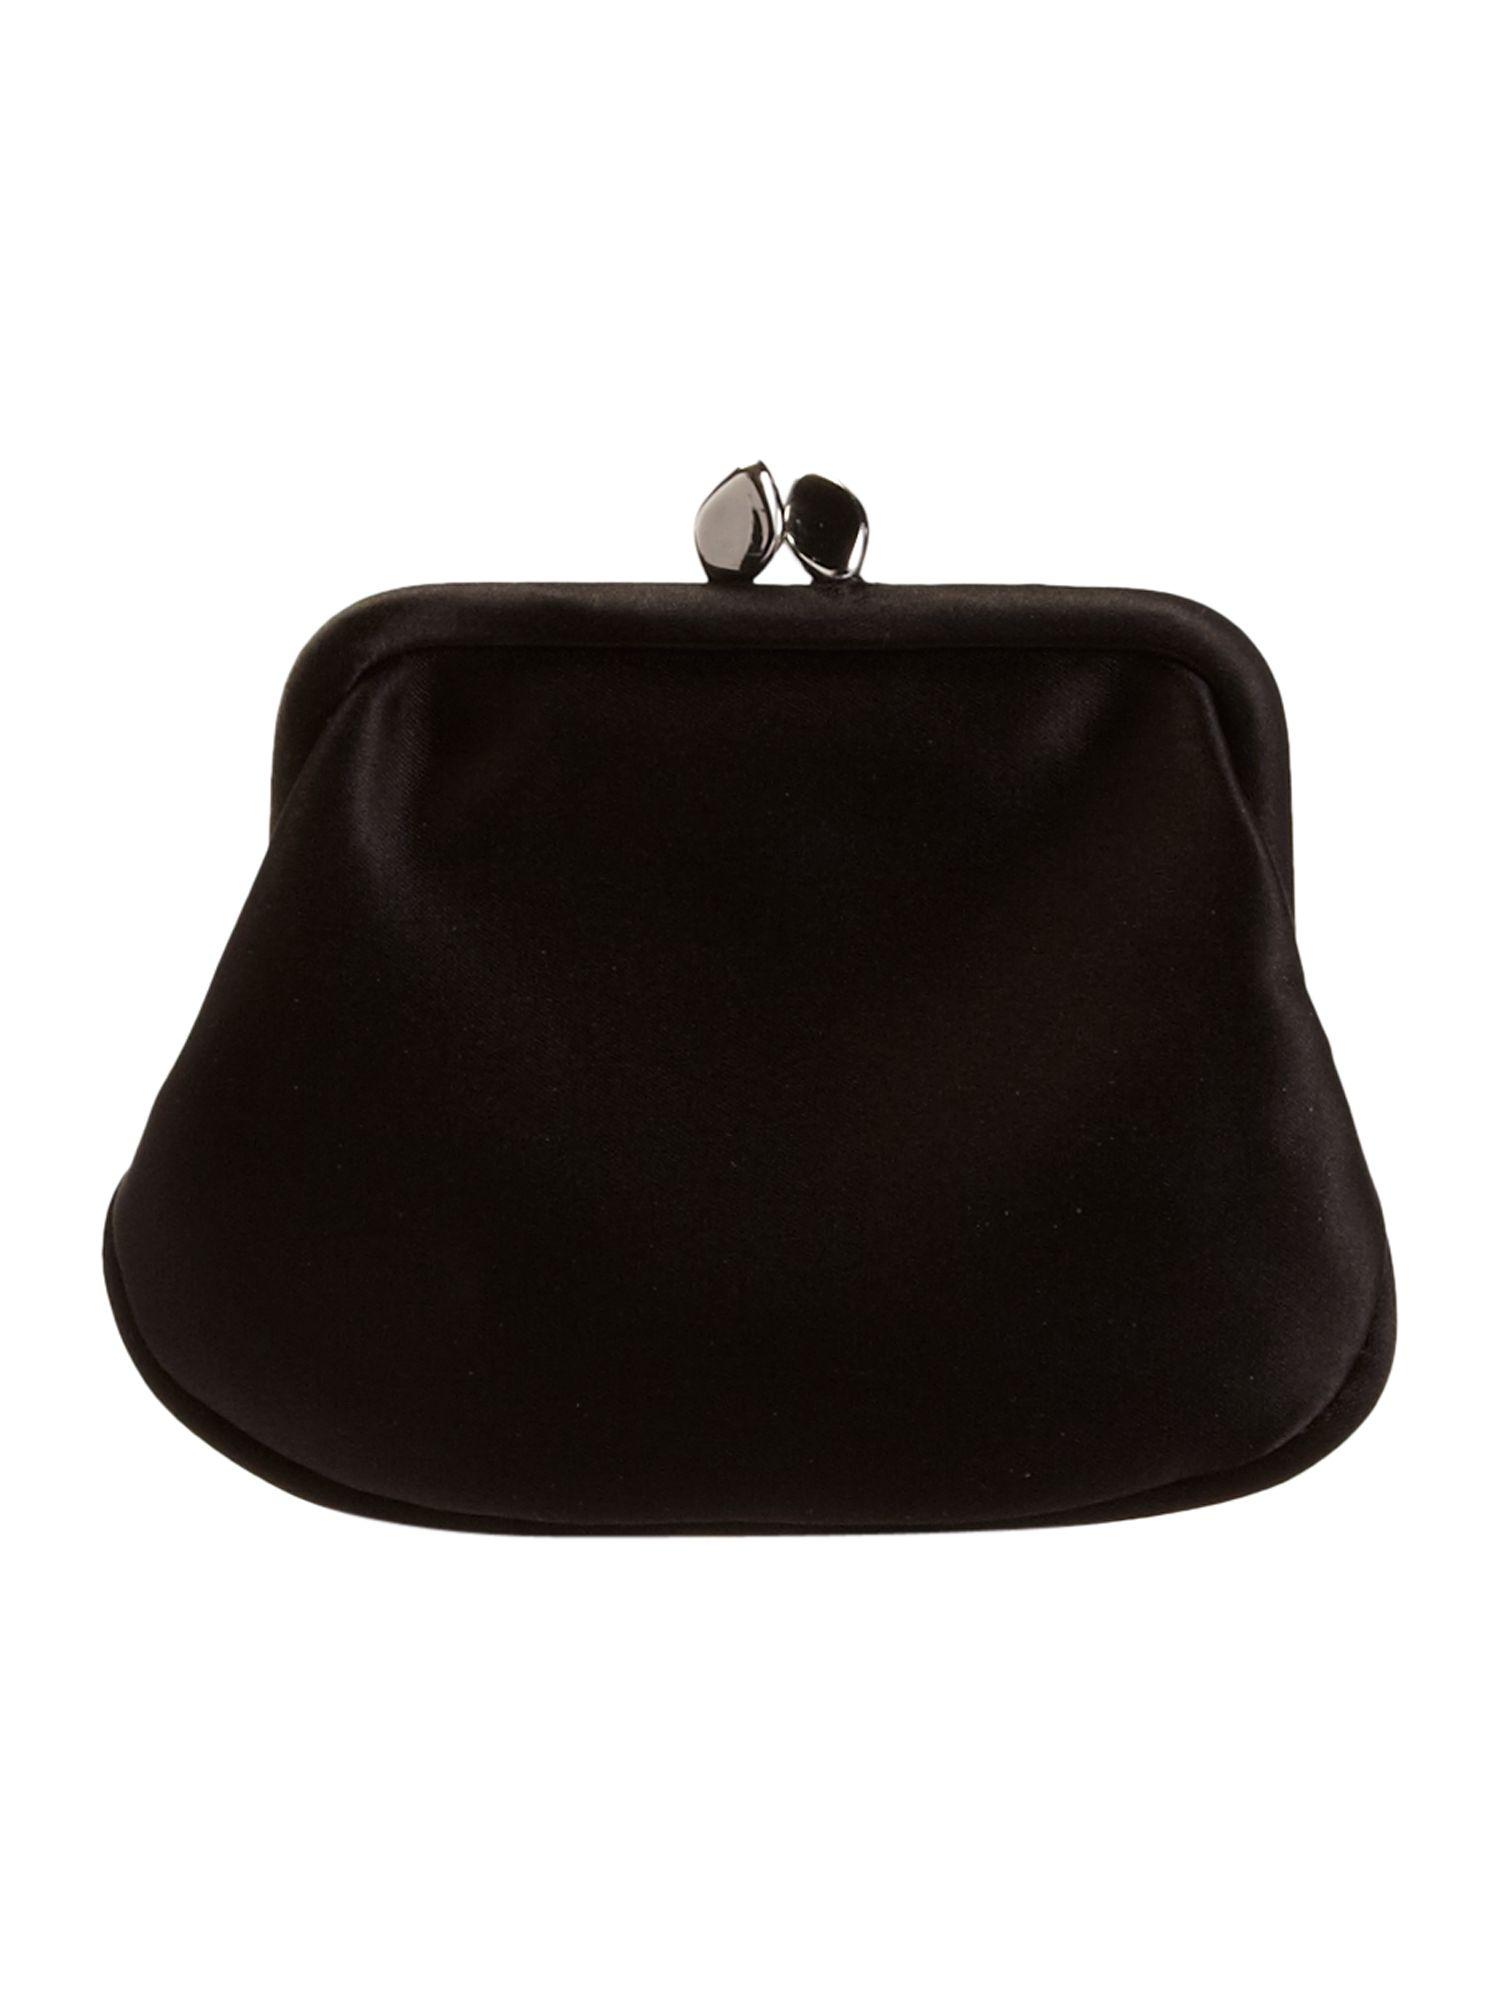 Lulu Guinness Handbag Money Mini Frame Purse in Black - Lyst